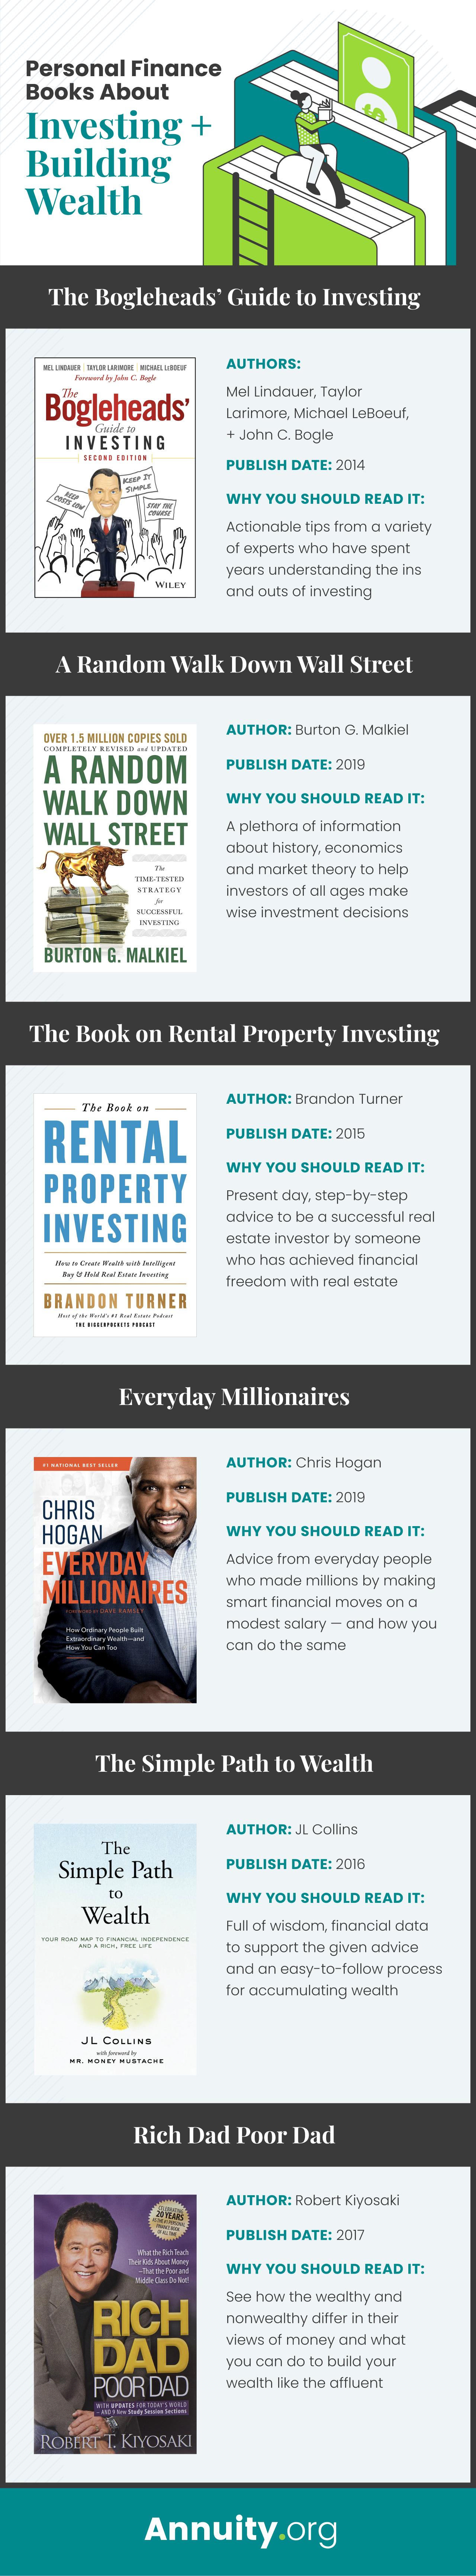 personal-finance-books-investing-wealth-v1